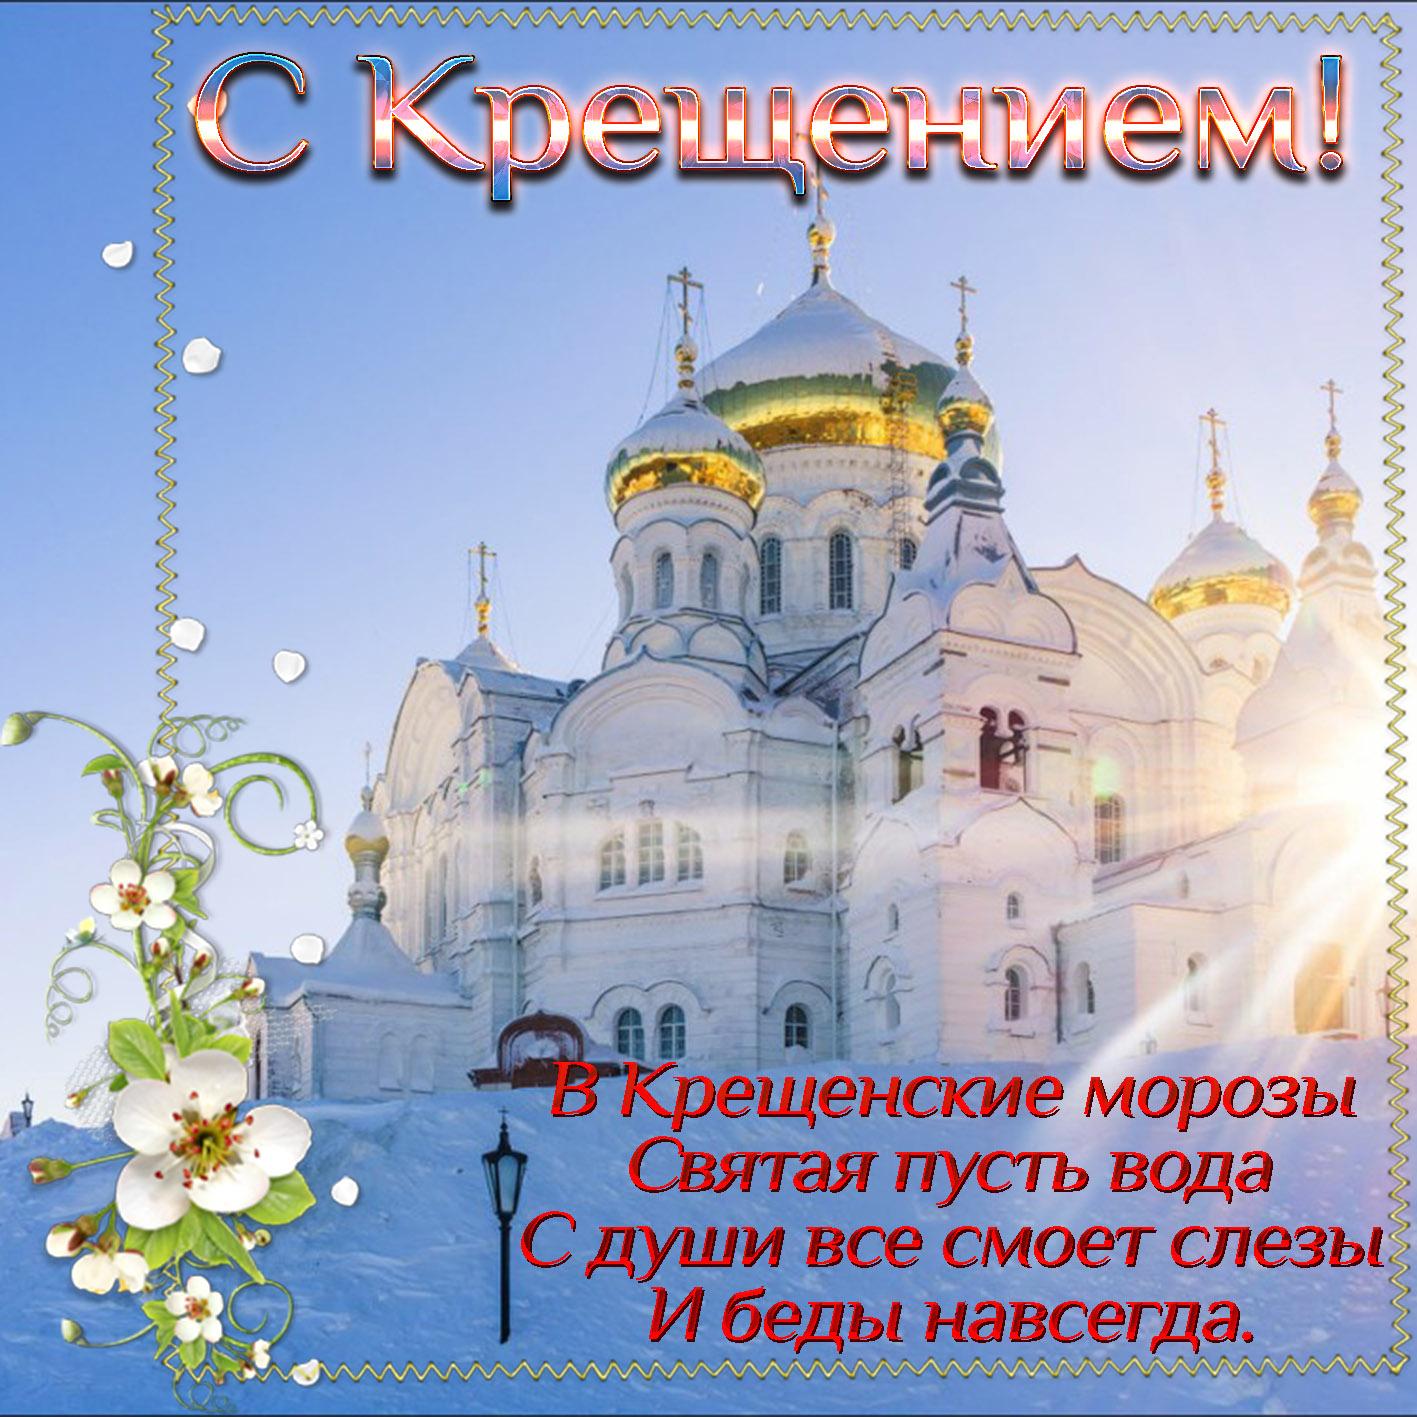 Картинка с храмом на Крещение Господне